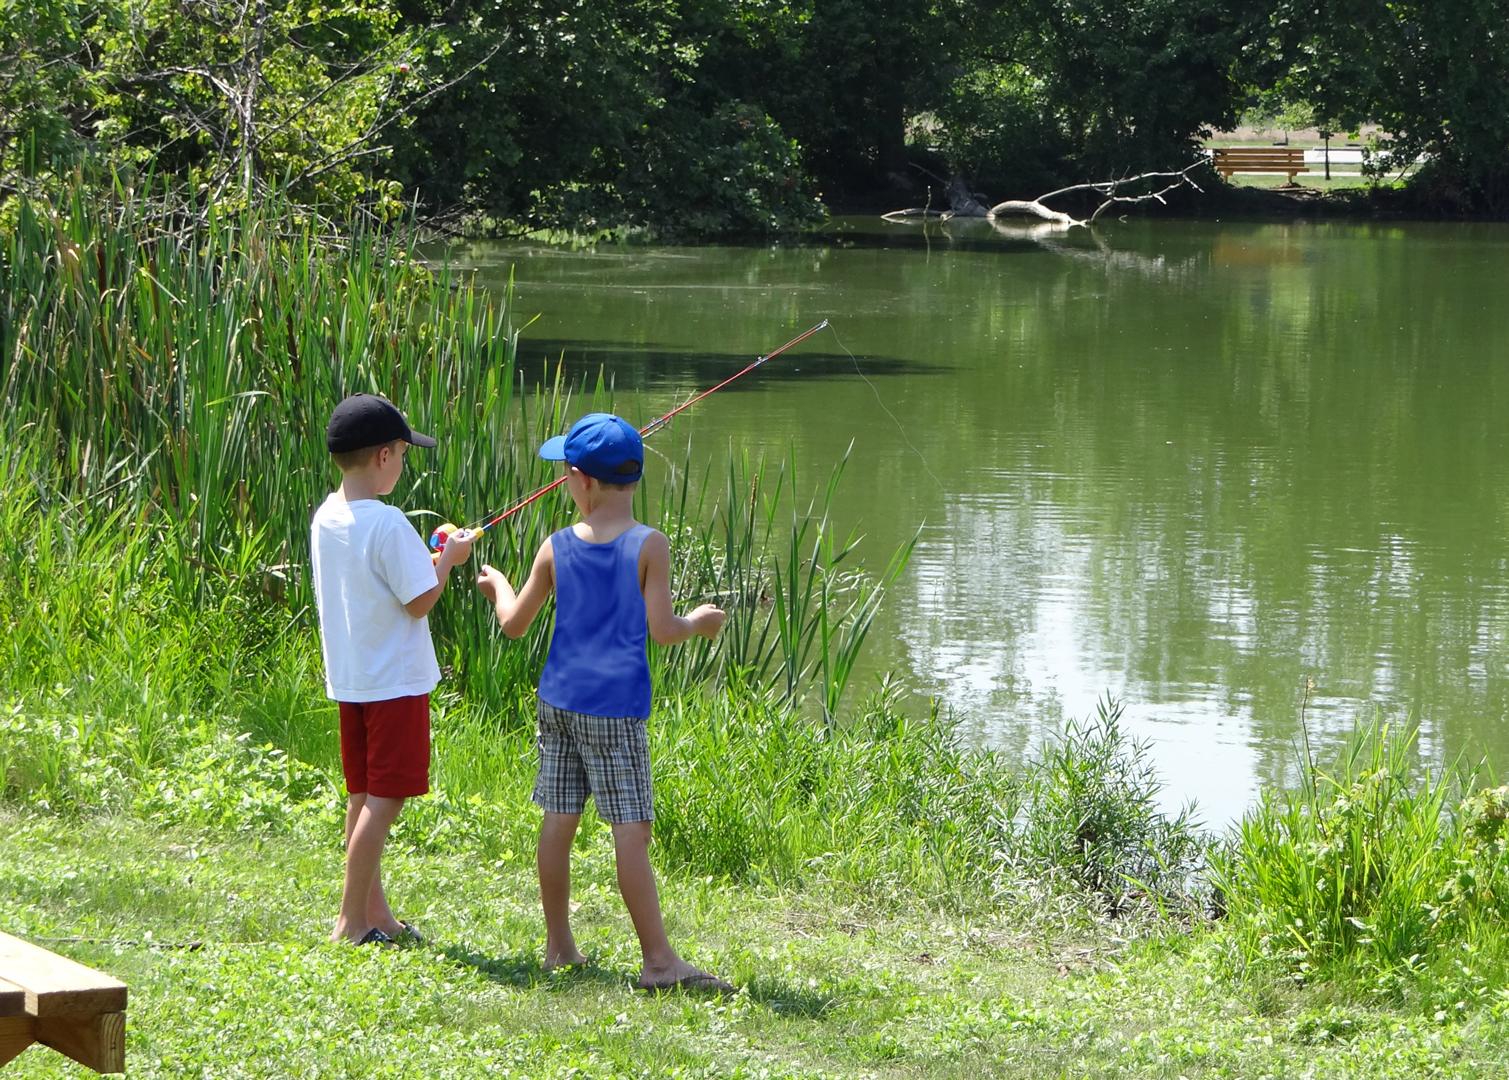 Two boys fish at Heron Pond in Three Creeks Metro Park